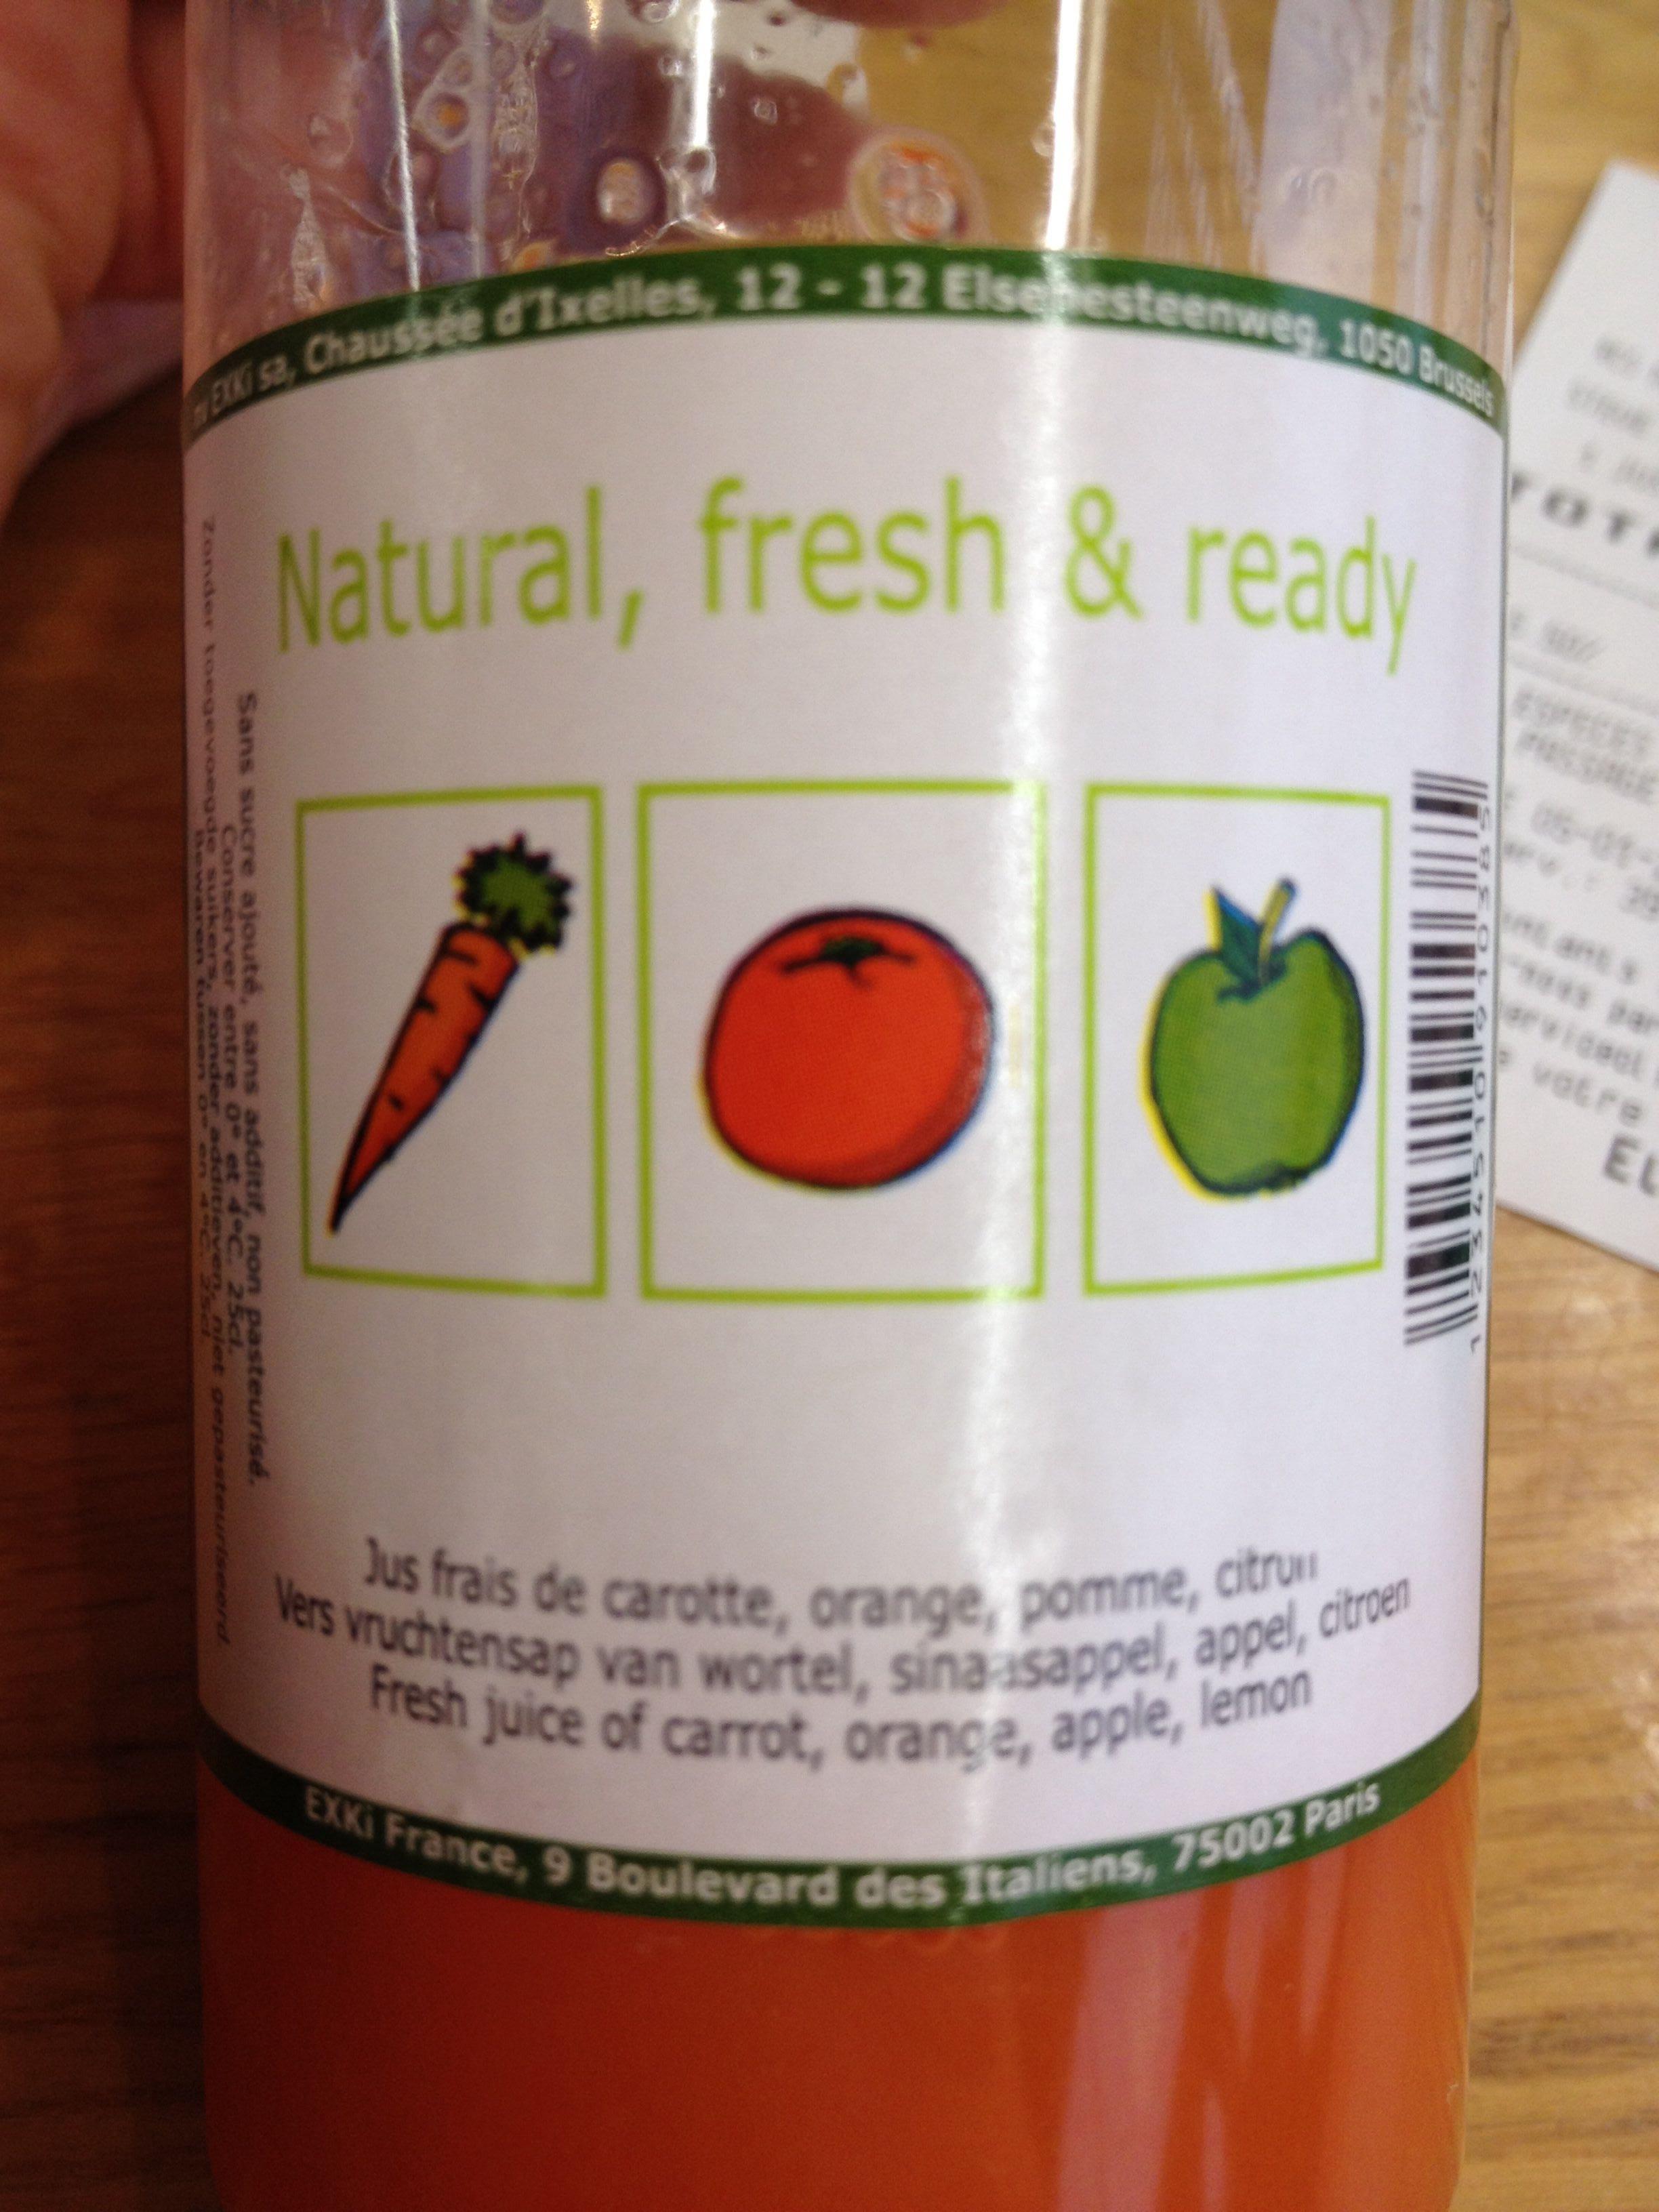 Natural, fresh & ready - Product